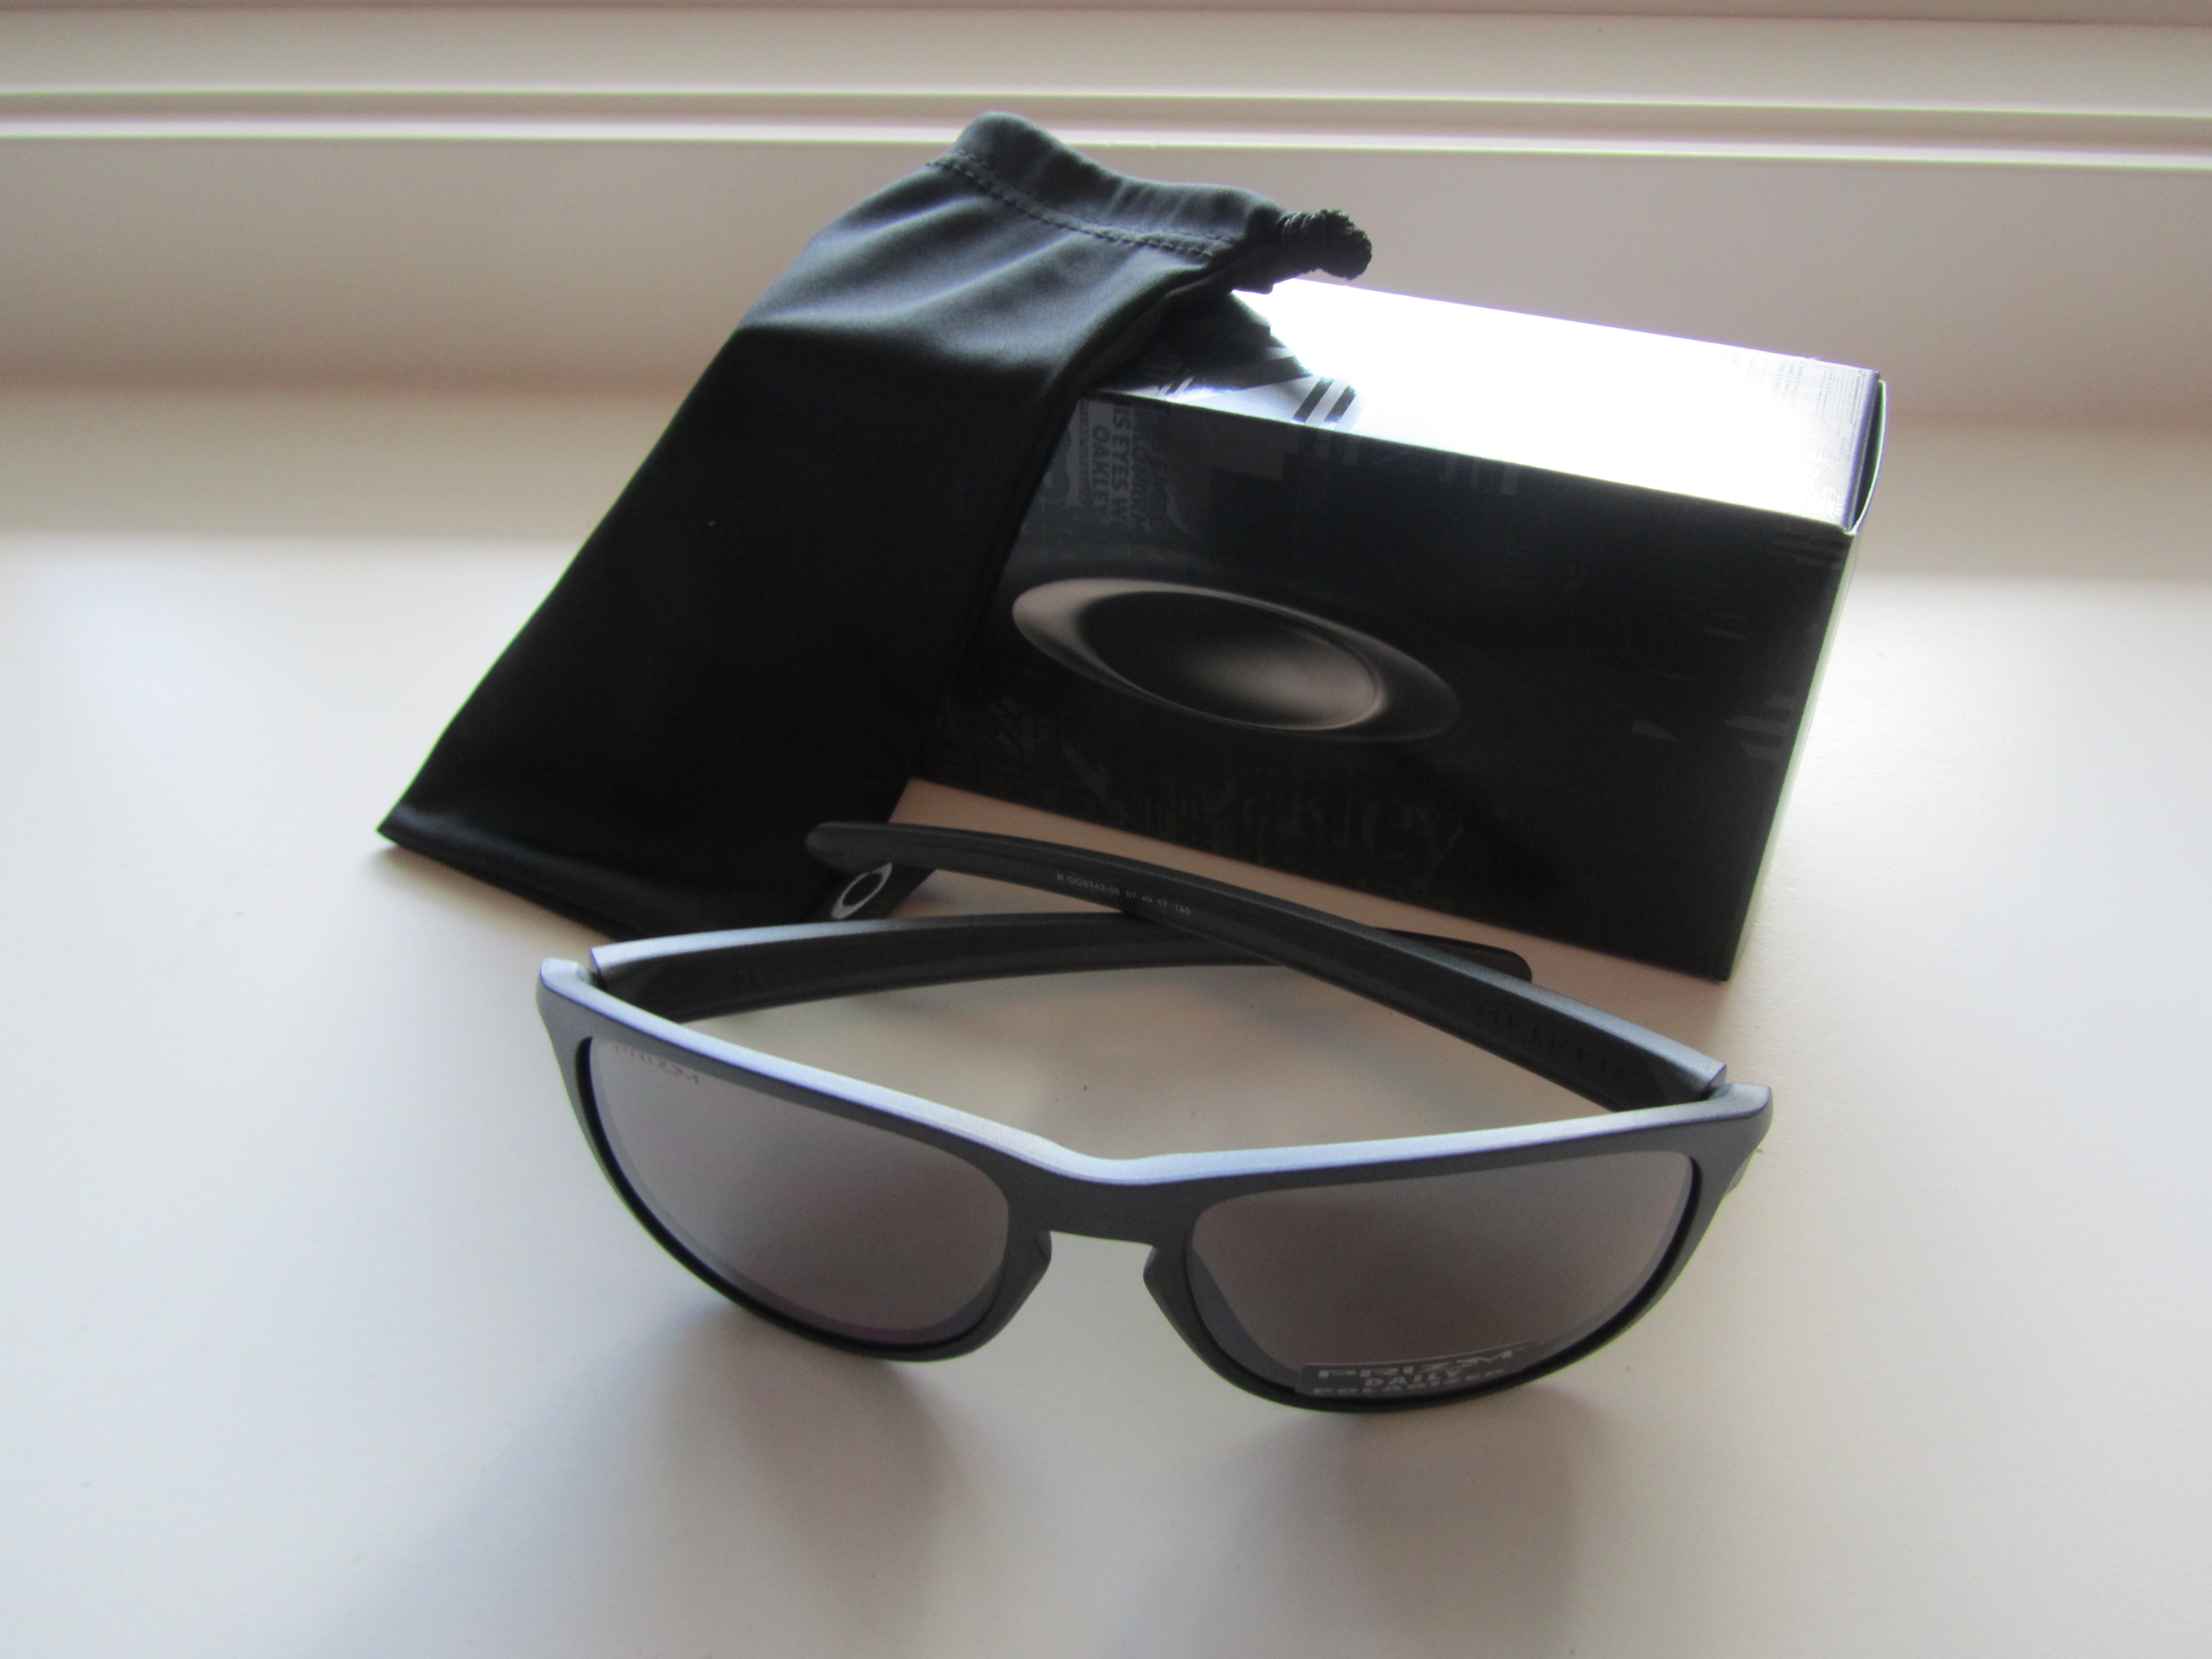 255640c2023 New Oakley Sliver R Sunglasses Steel Prizm Daily Polarized OO9342-08 ...